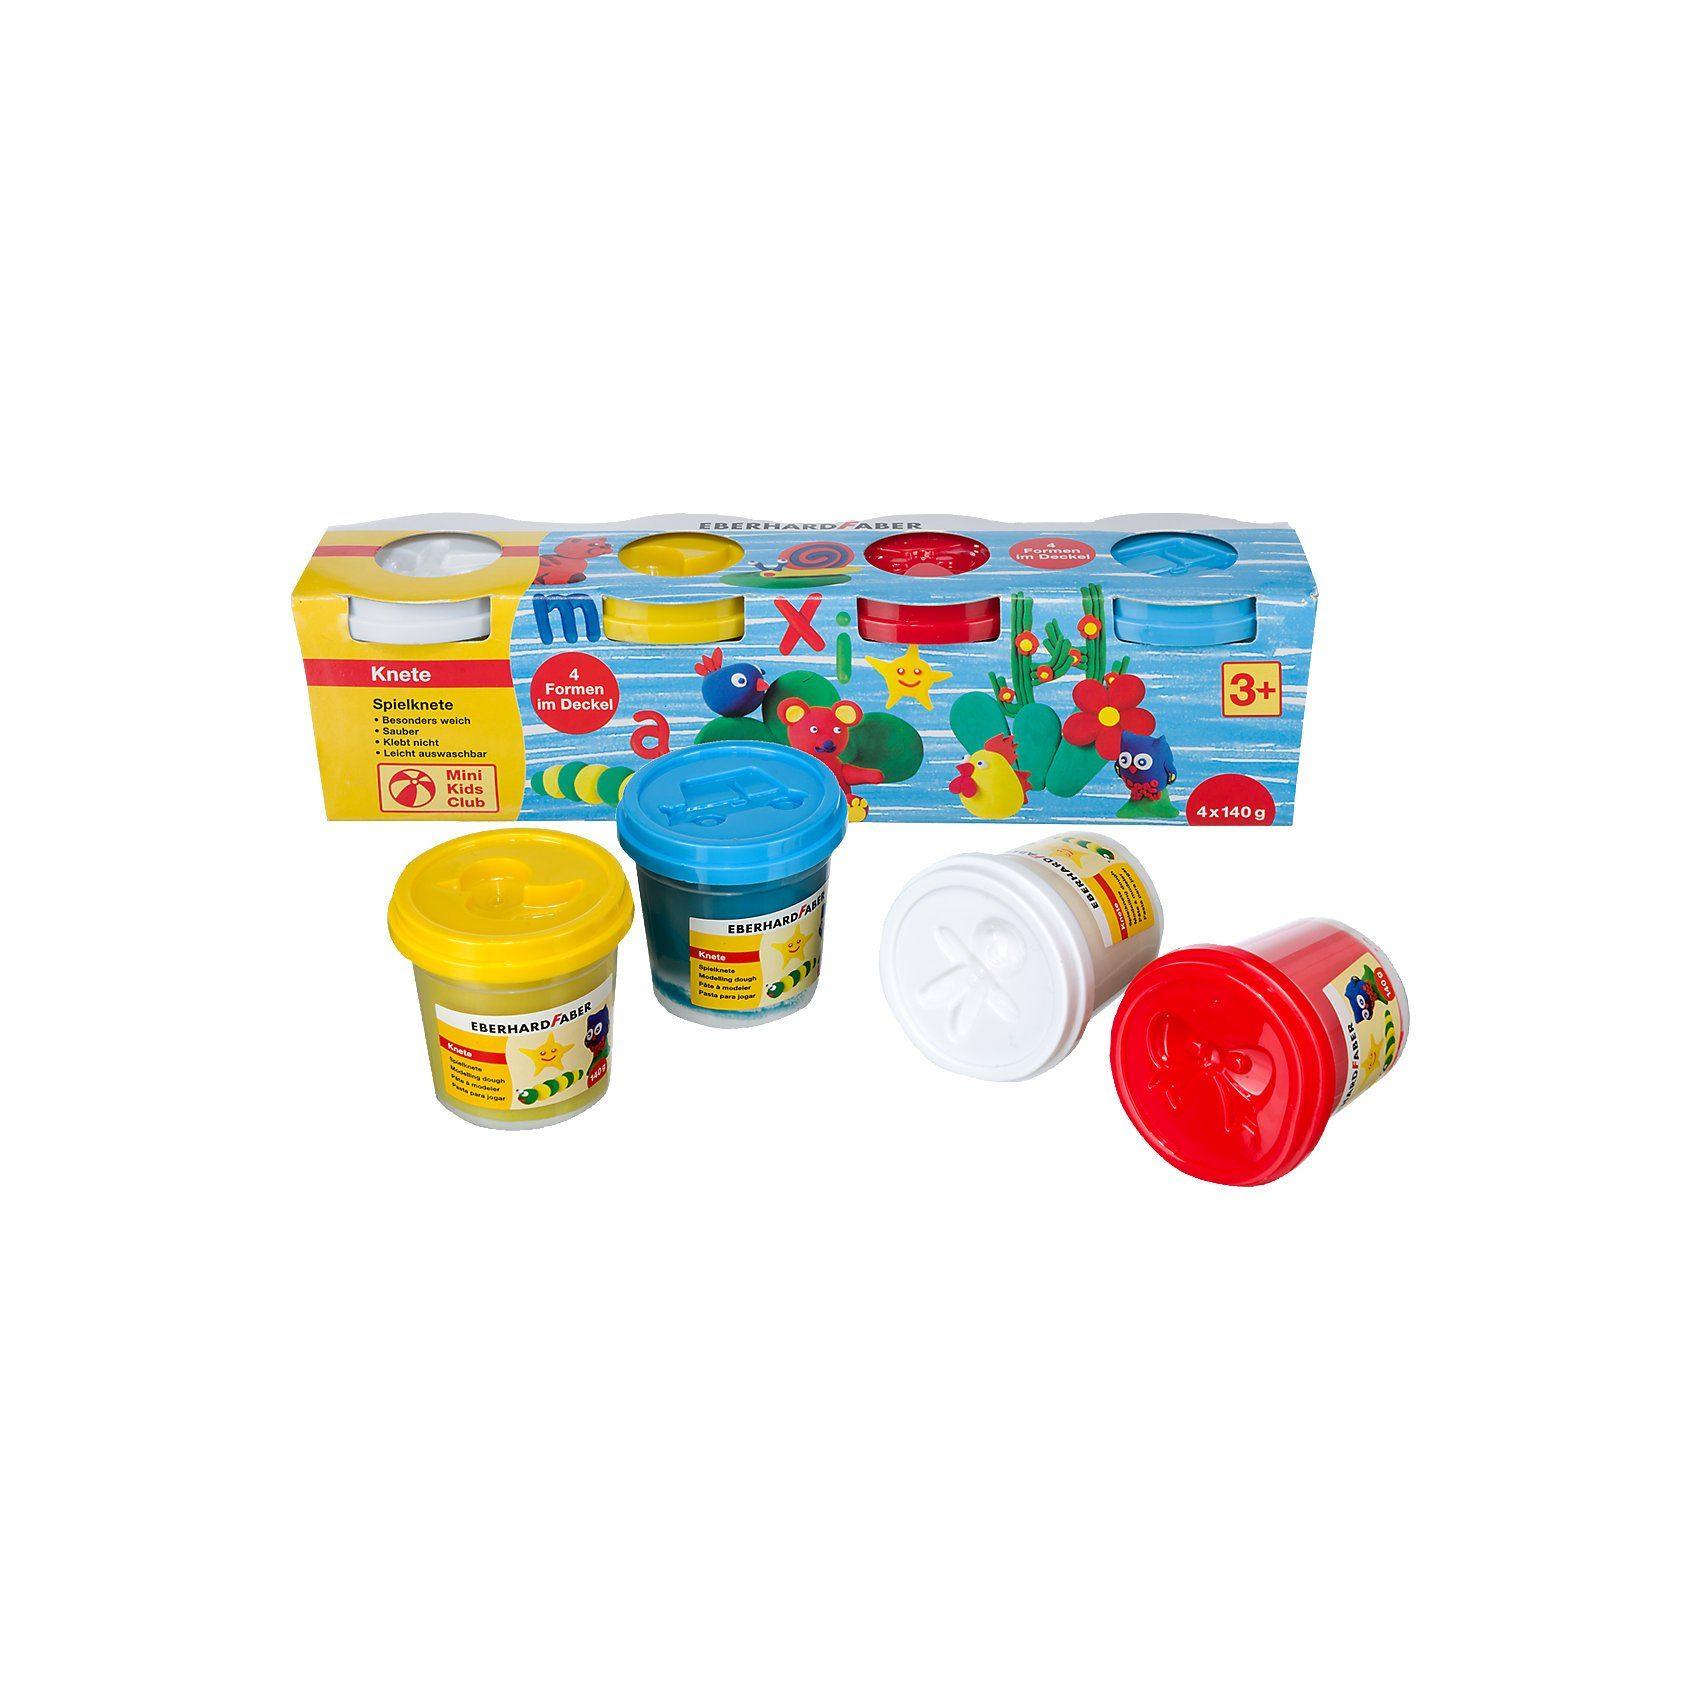 Eberhard Faber Mini Kids Spielknete Basisfarben, 4 x 140 g